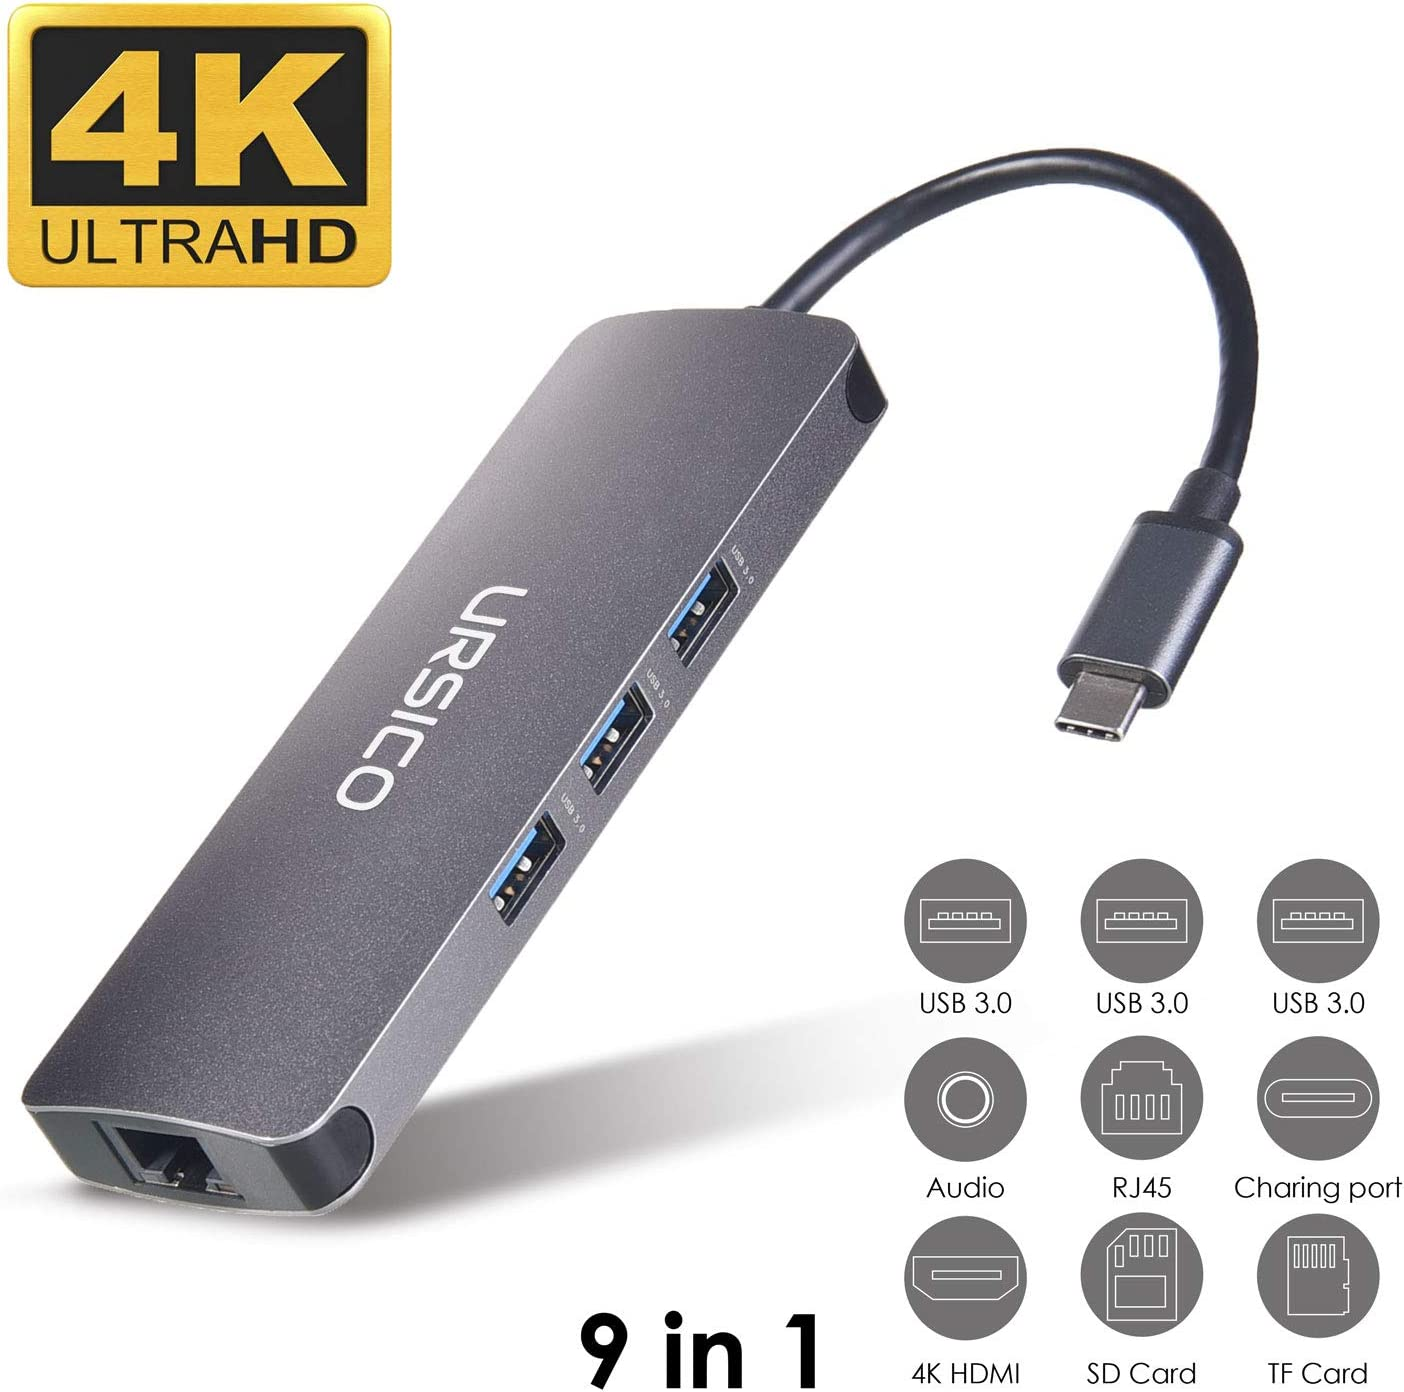 URSICO Hub USB C 9 En 1, Tipo C Adaptador con 4K HDMI, Ethernet Rj45, 3 USB 3.0, Mic/Audio, PD...